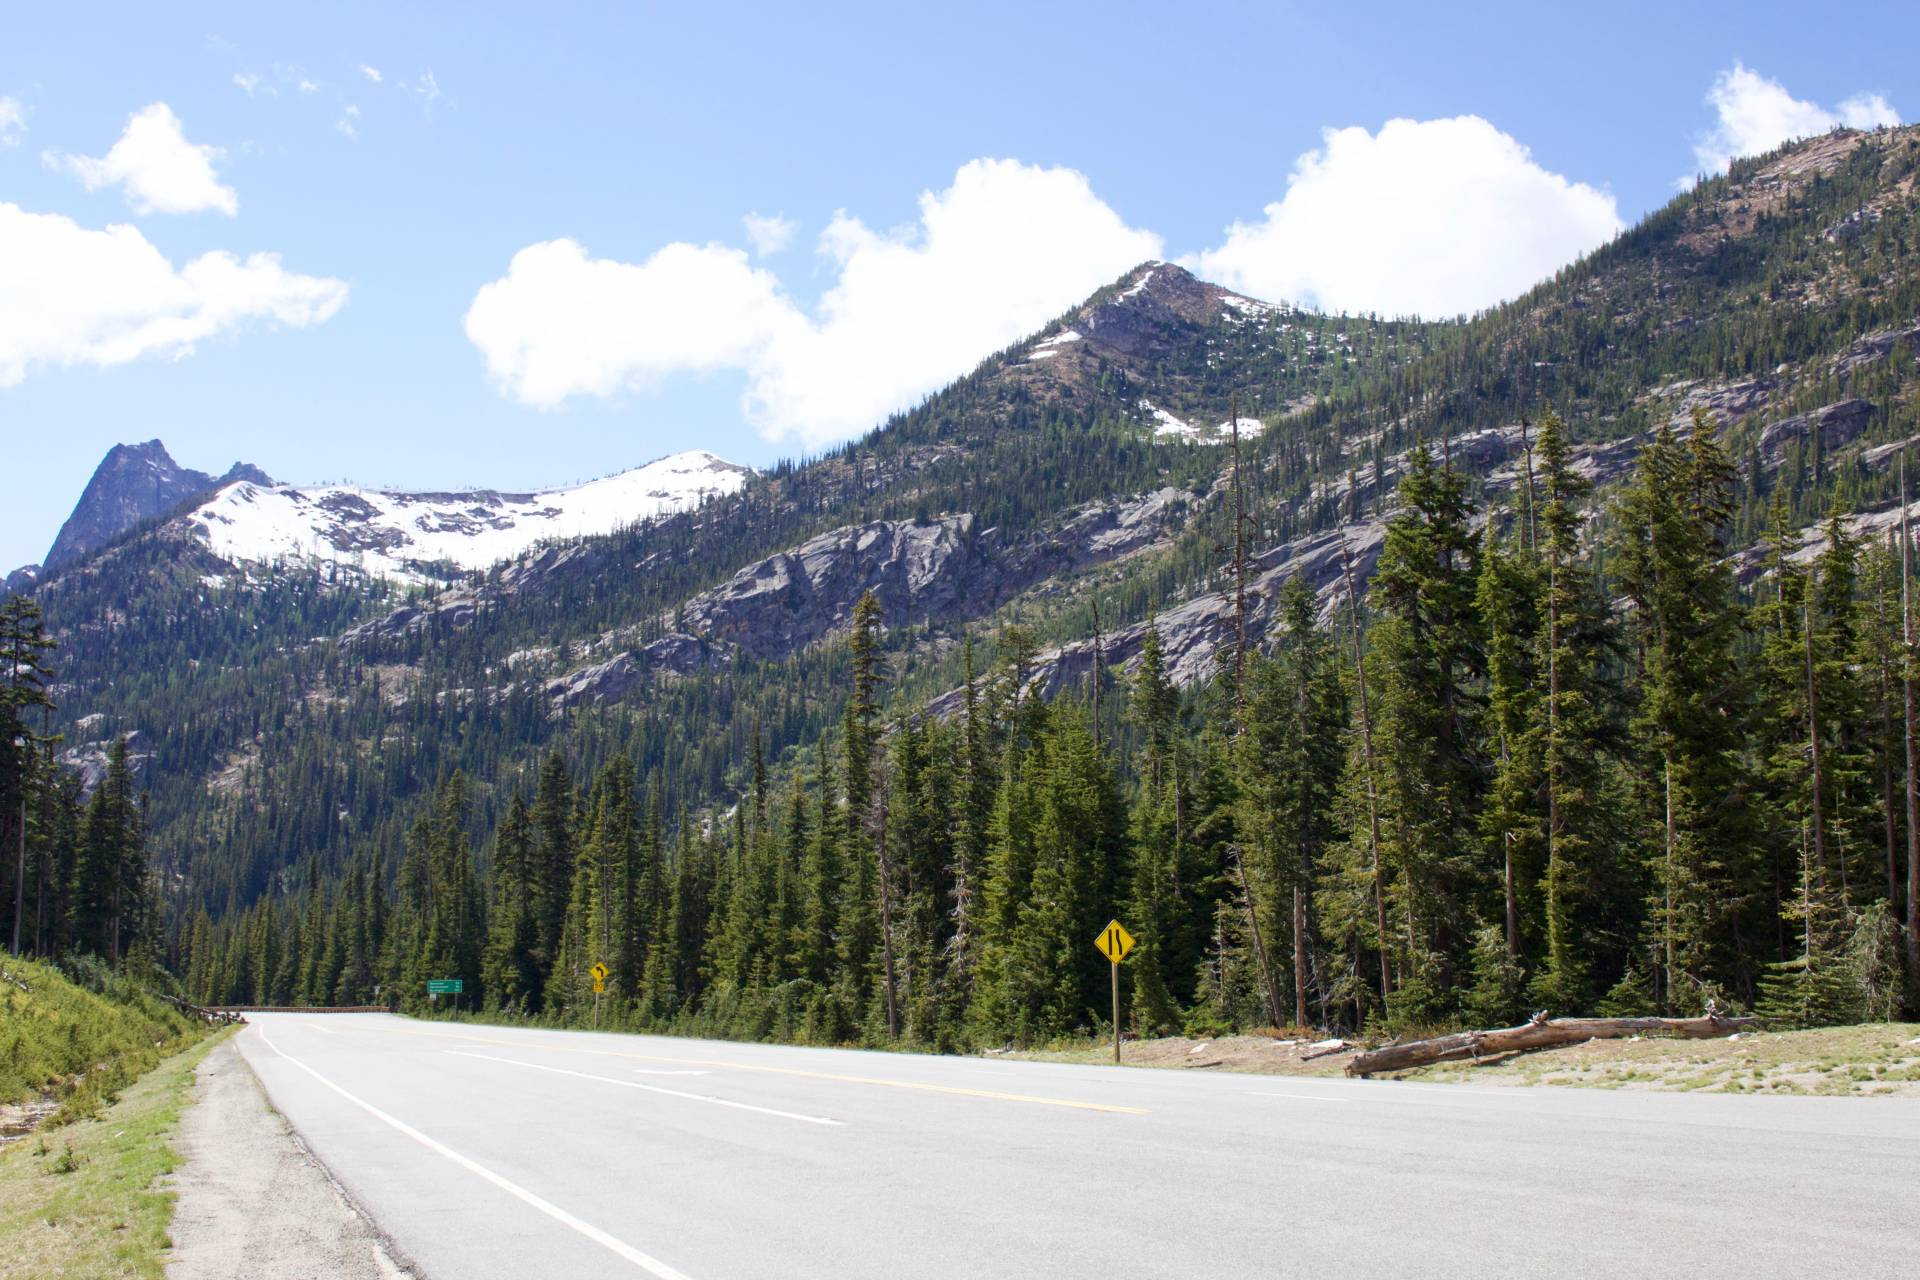 Highway 20 summer roadtrip to Mazama and Winthrop, WA